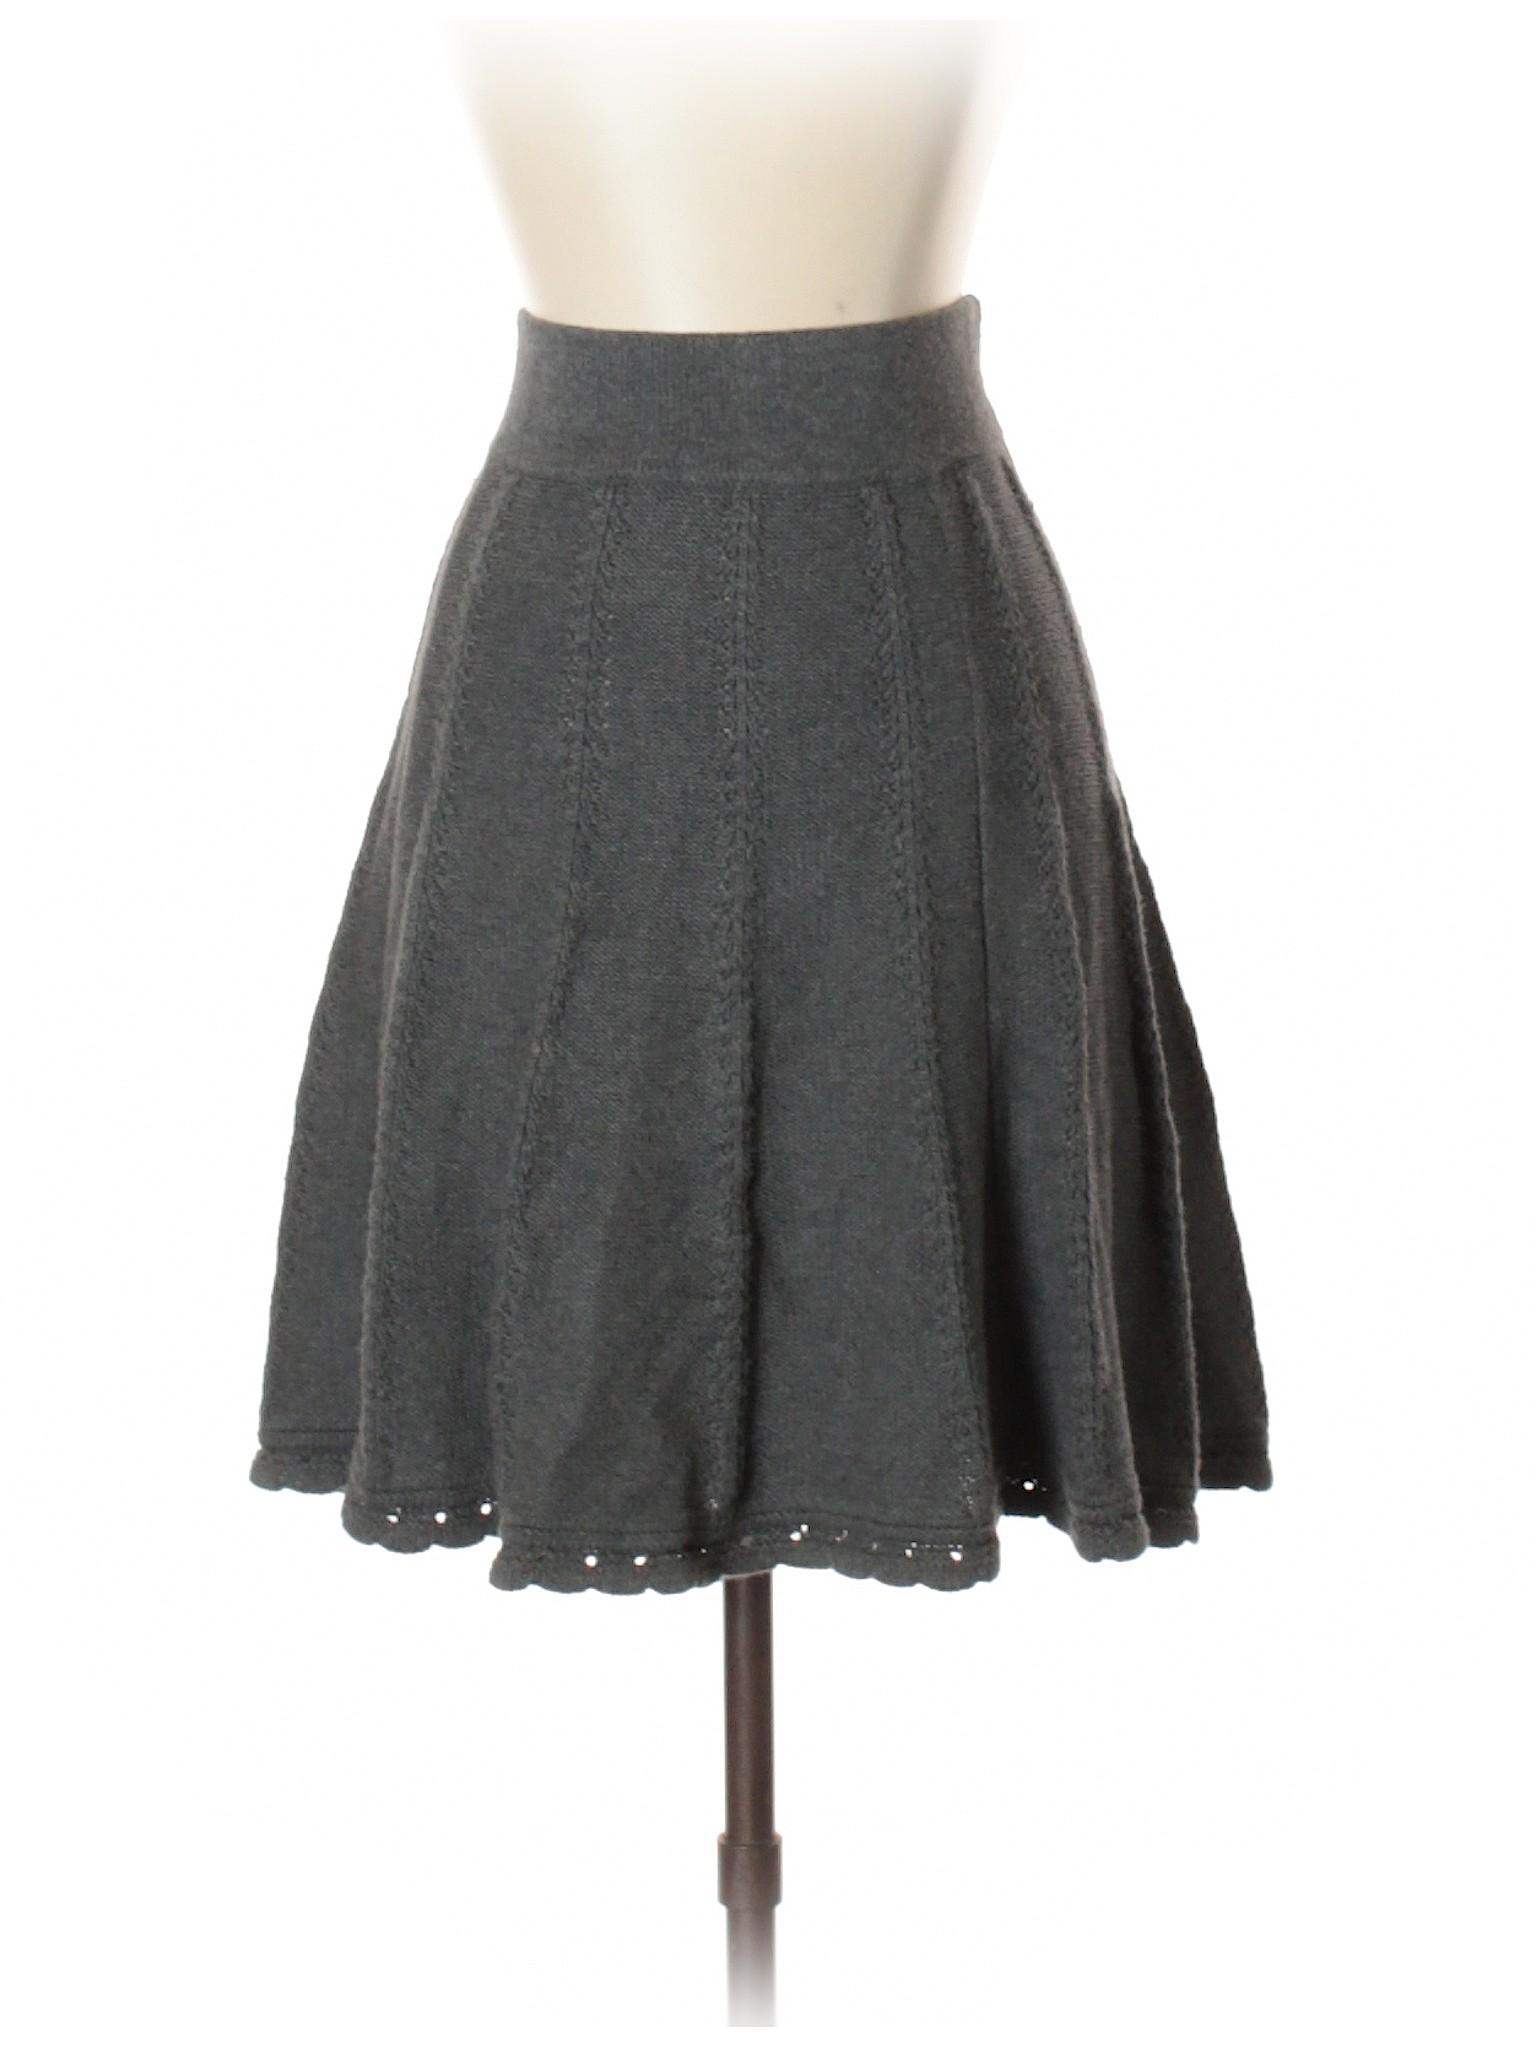 Skirt Boutique Casual Boutique Casual X0qq4Y